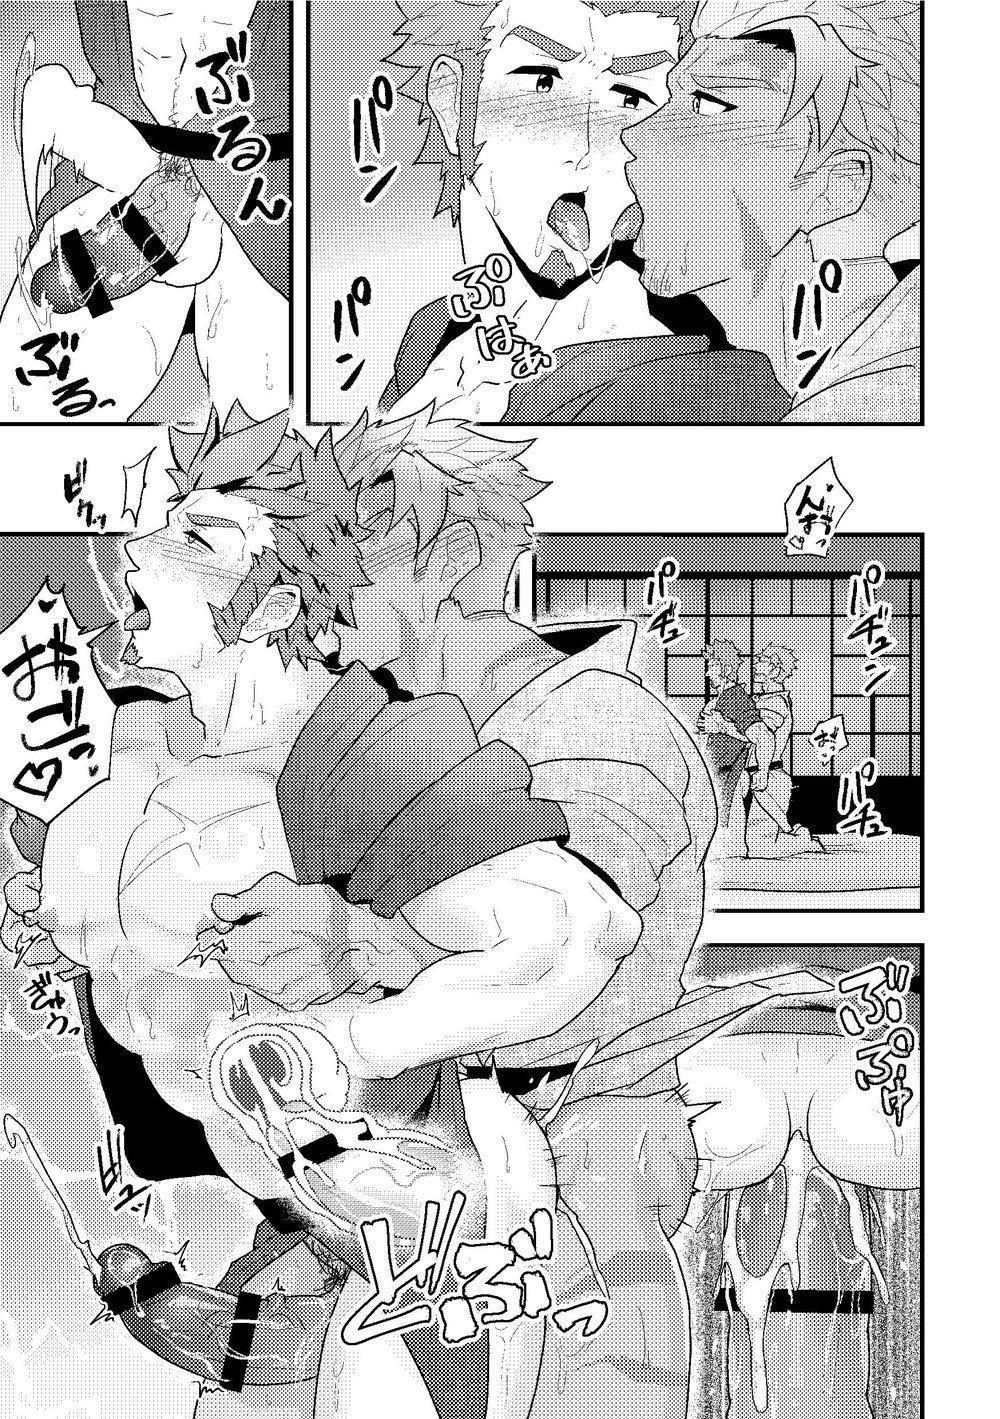 """Sakki no Hanashi no Tsuzuki to Ikou ze.""   Let's keep talking about that 11"